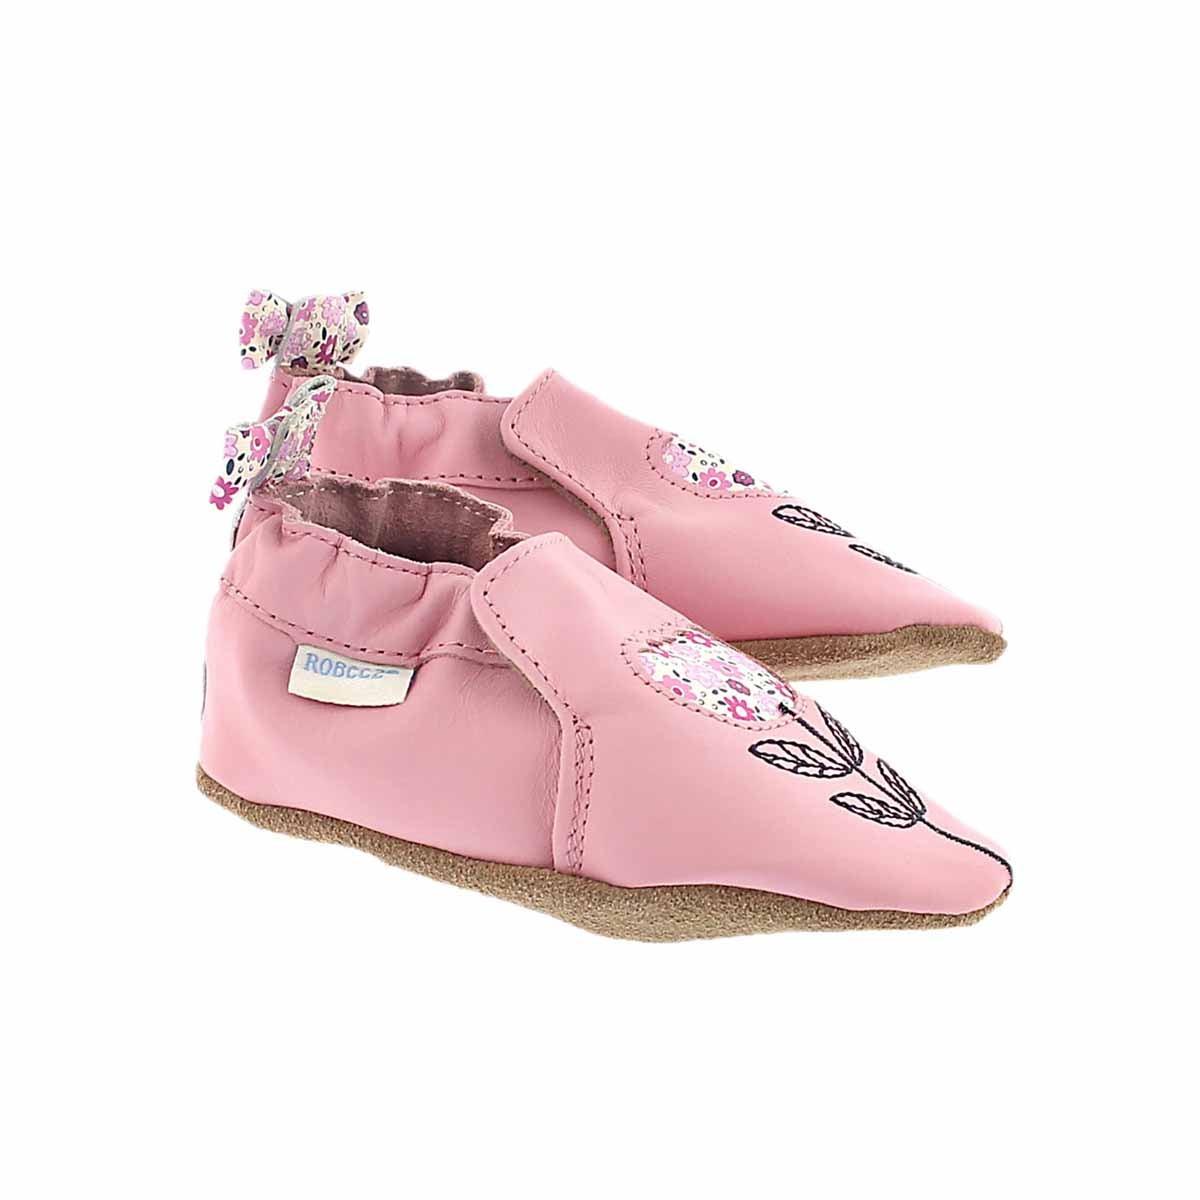 Inf Tina Tulip pink soft slipper